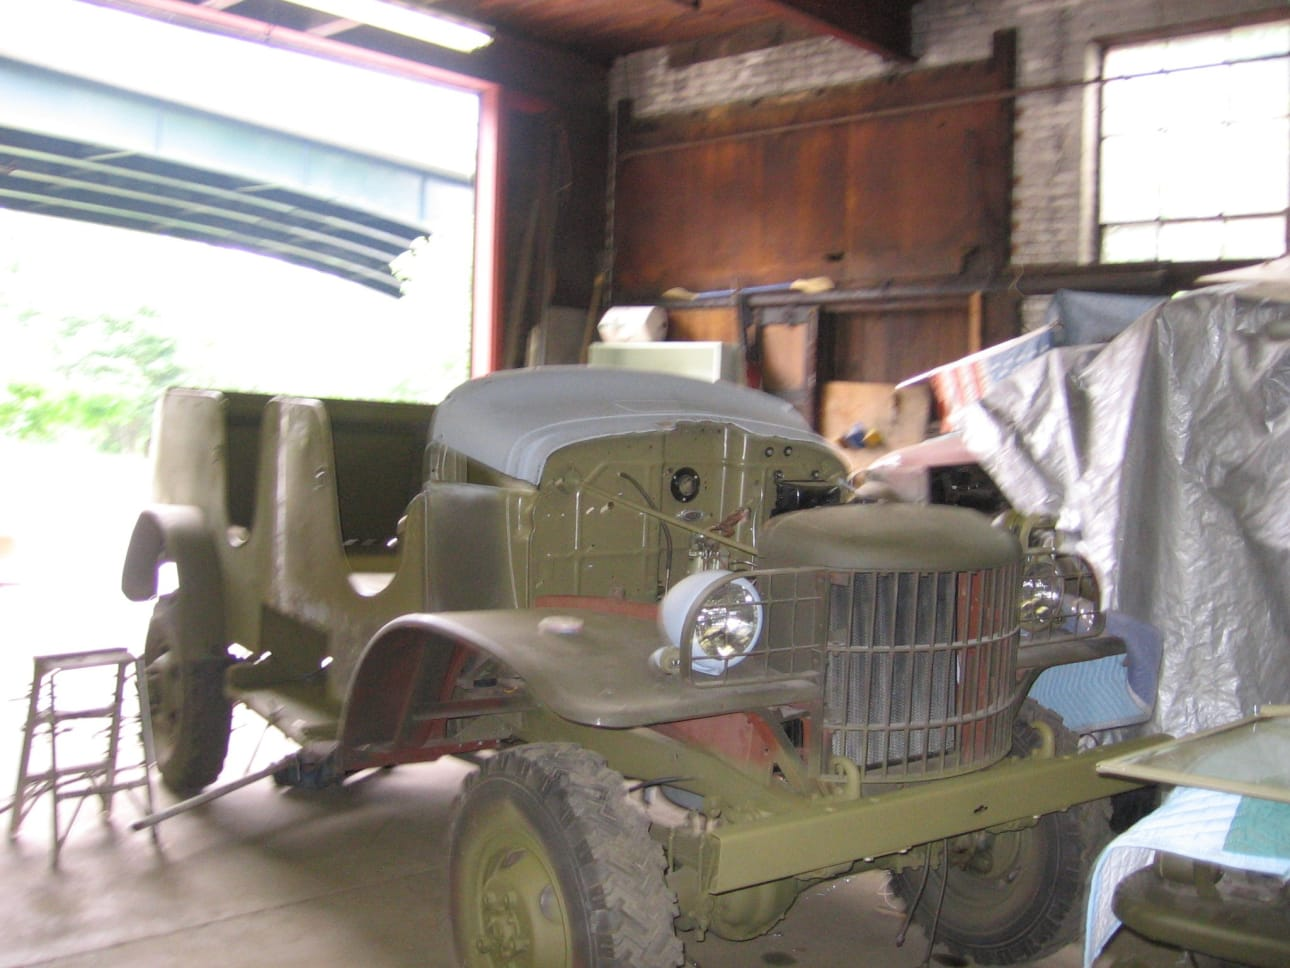 Restoration & Maintenance of Military Vehicles